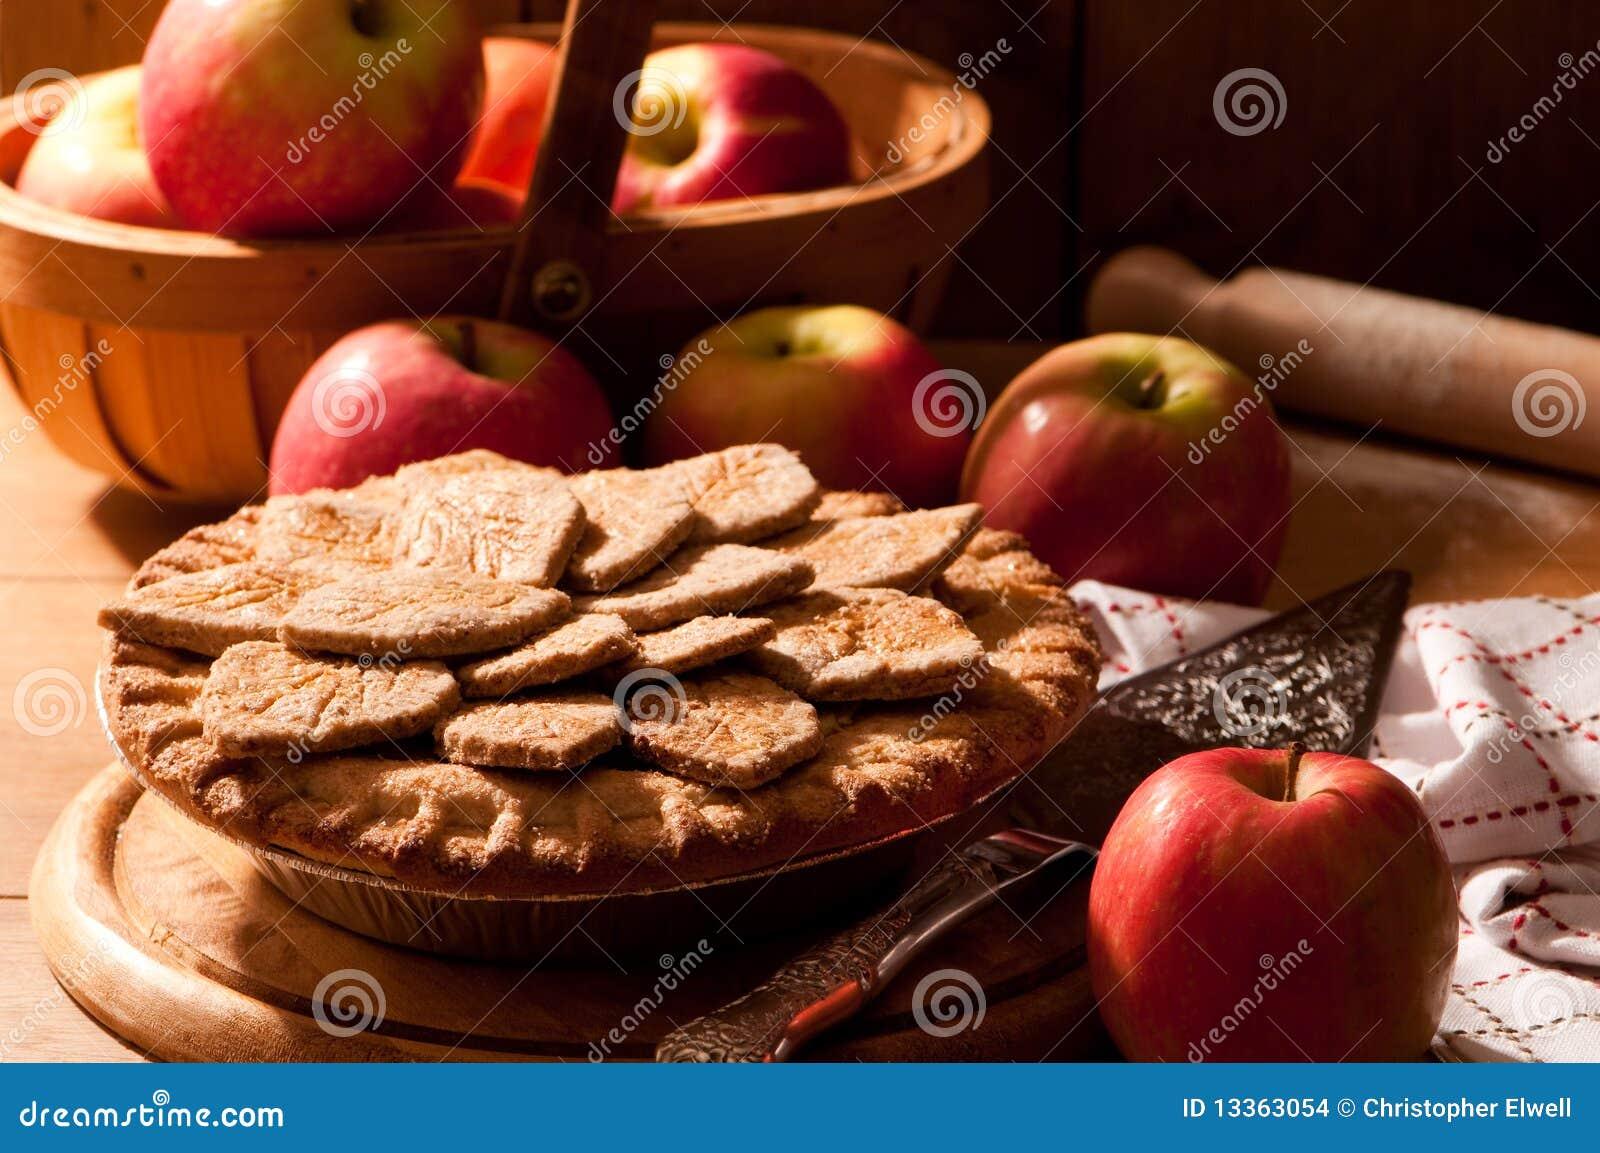 Apple Pie Stock Images - Image: 13363054